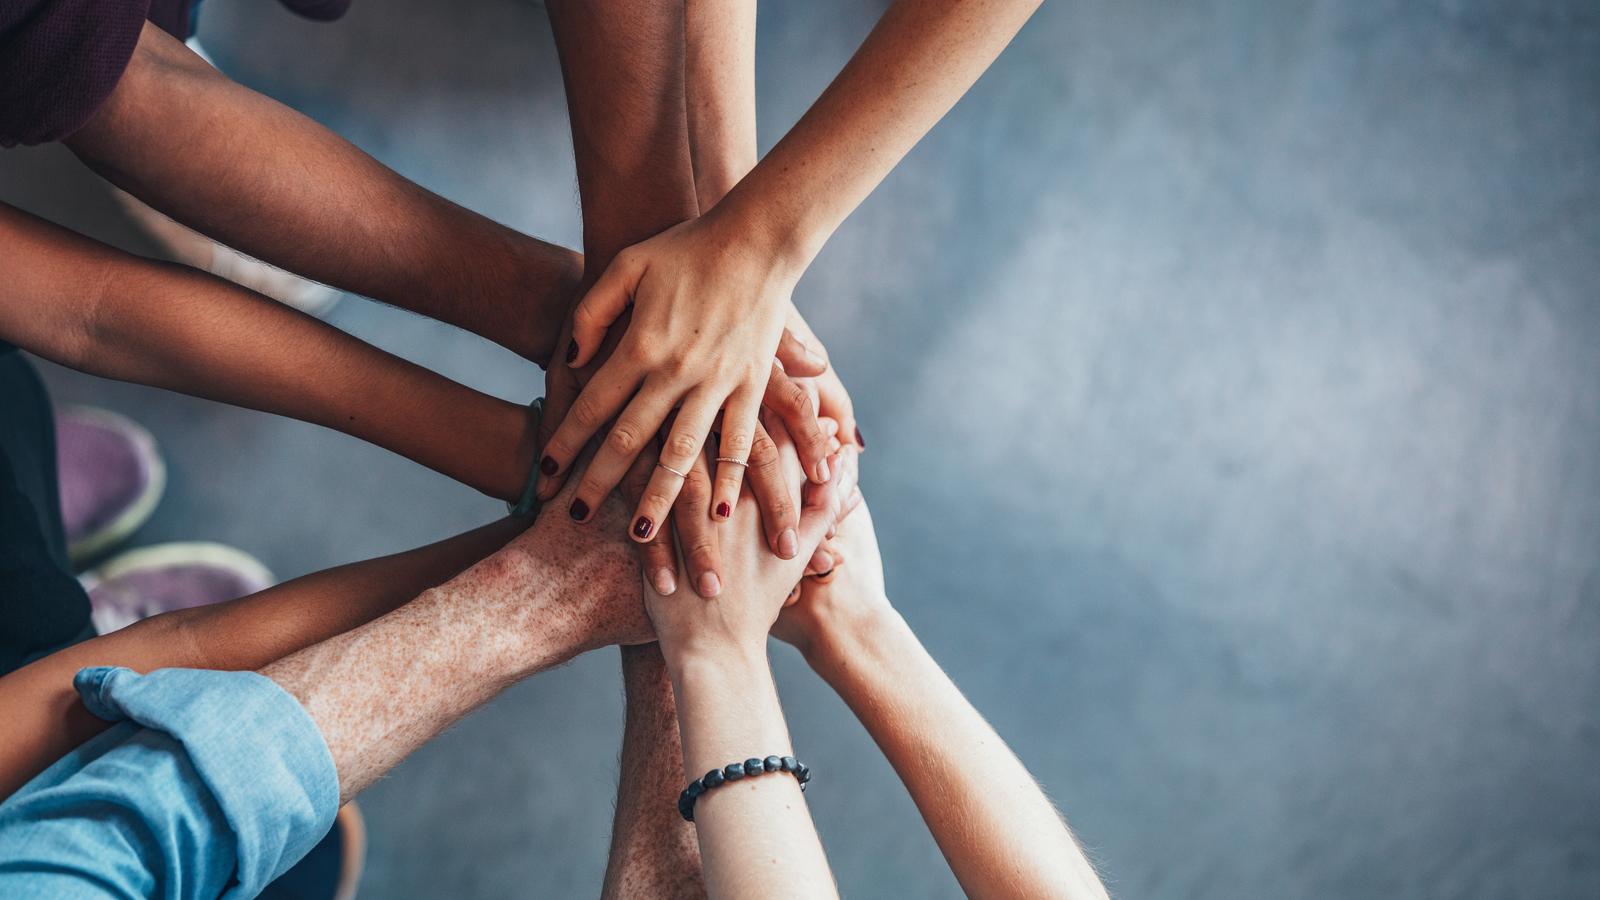 Image of hands together